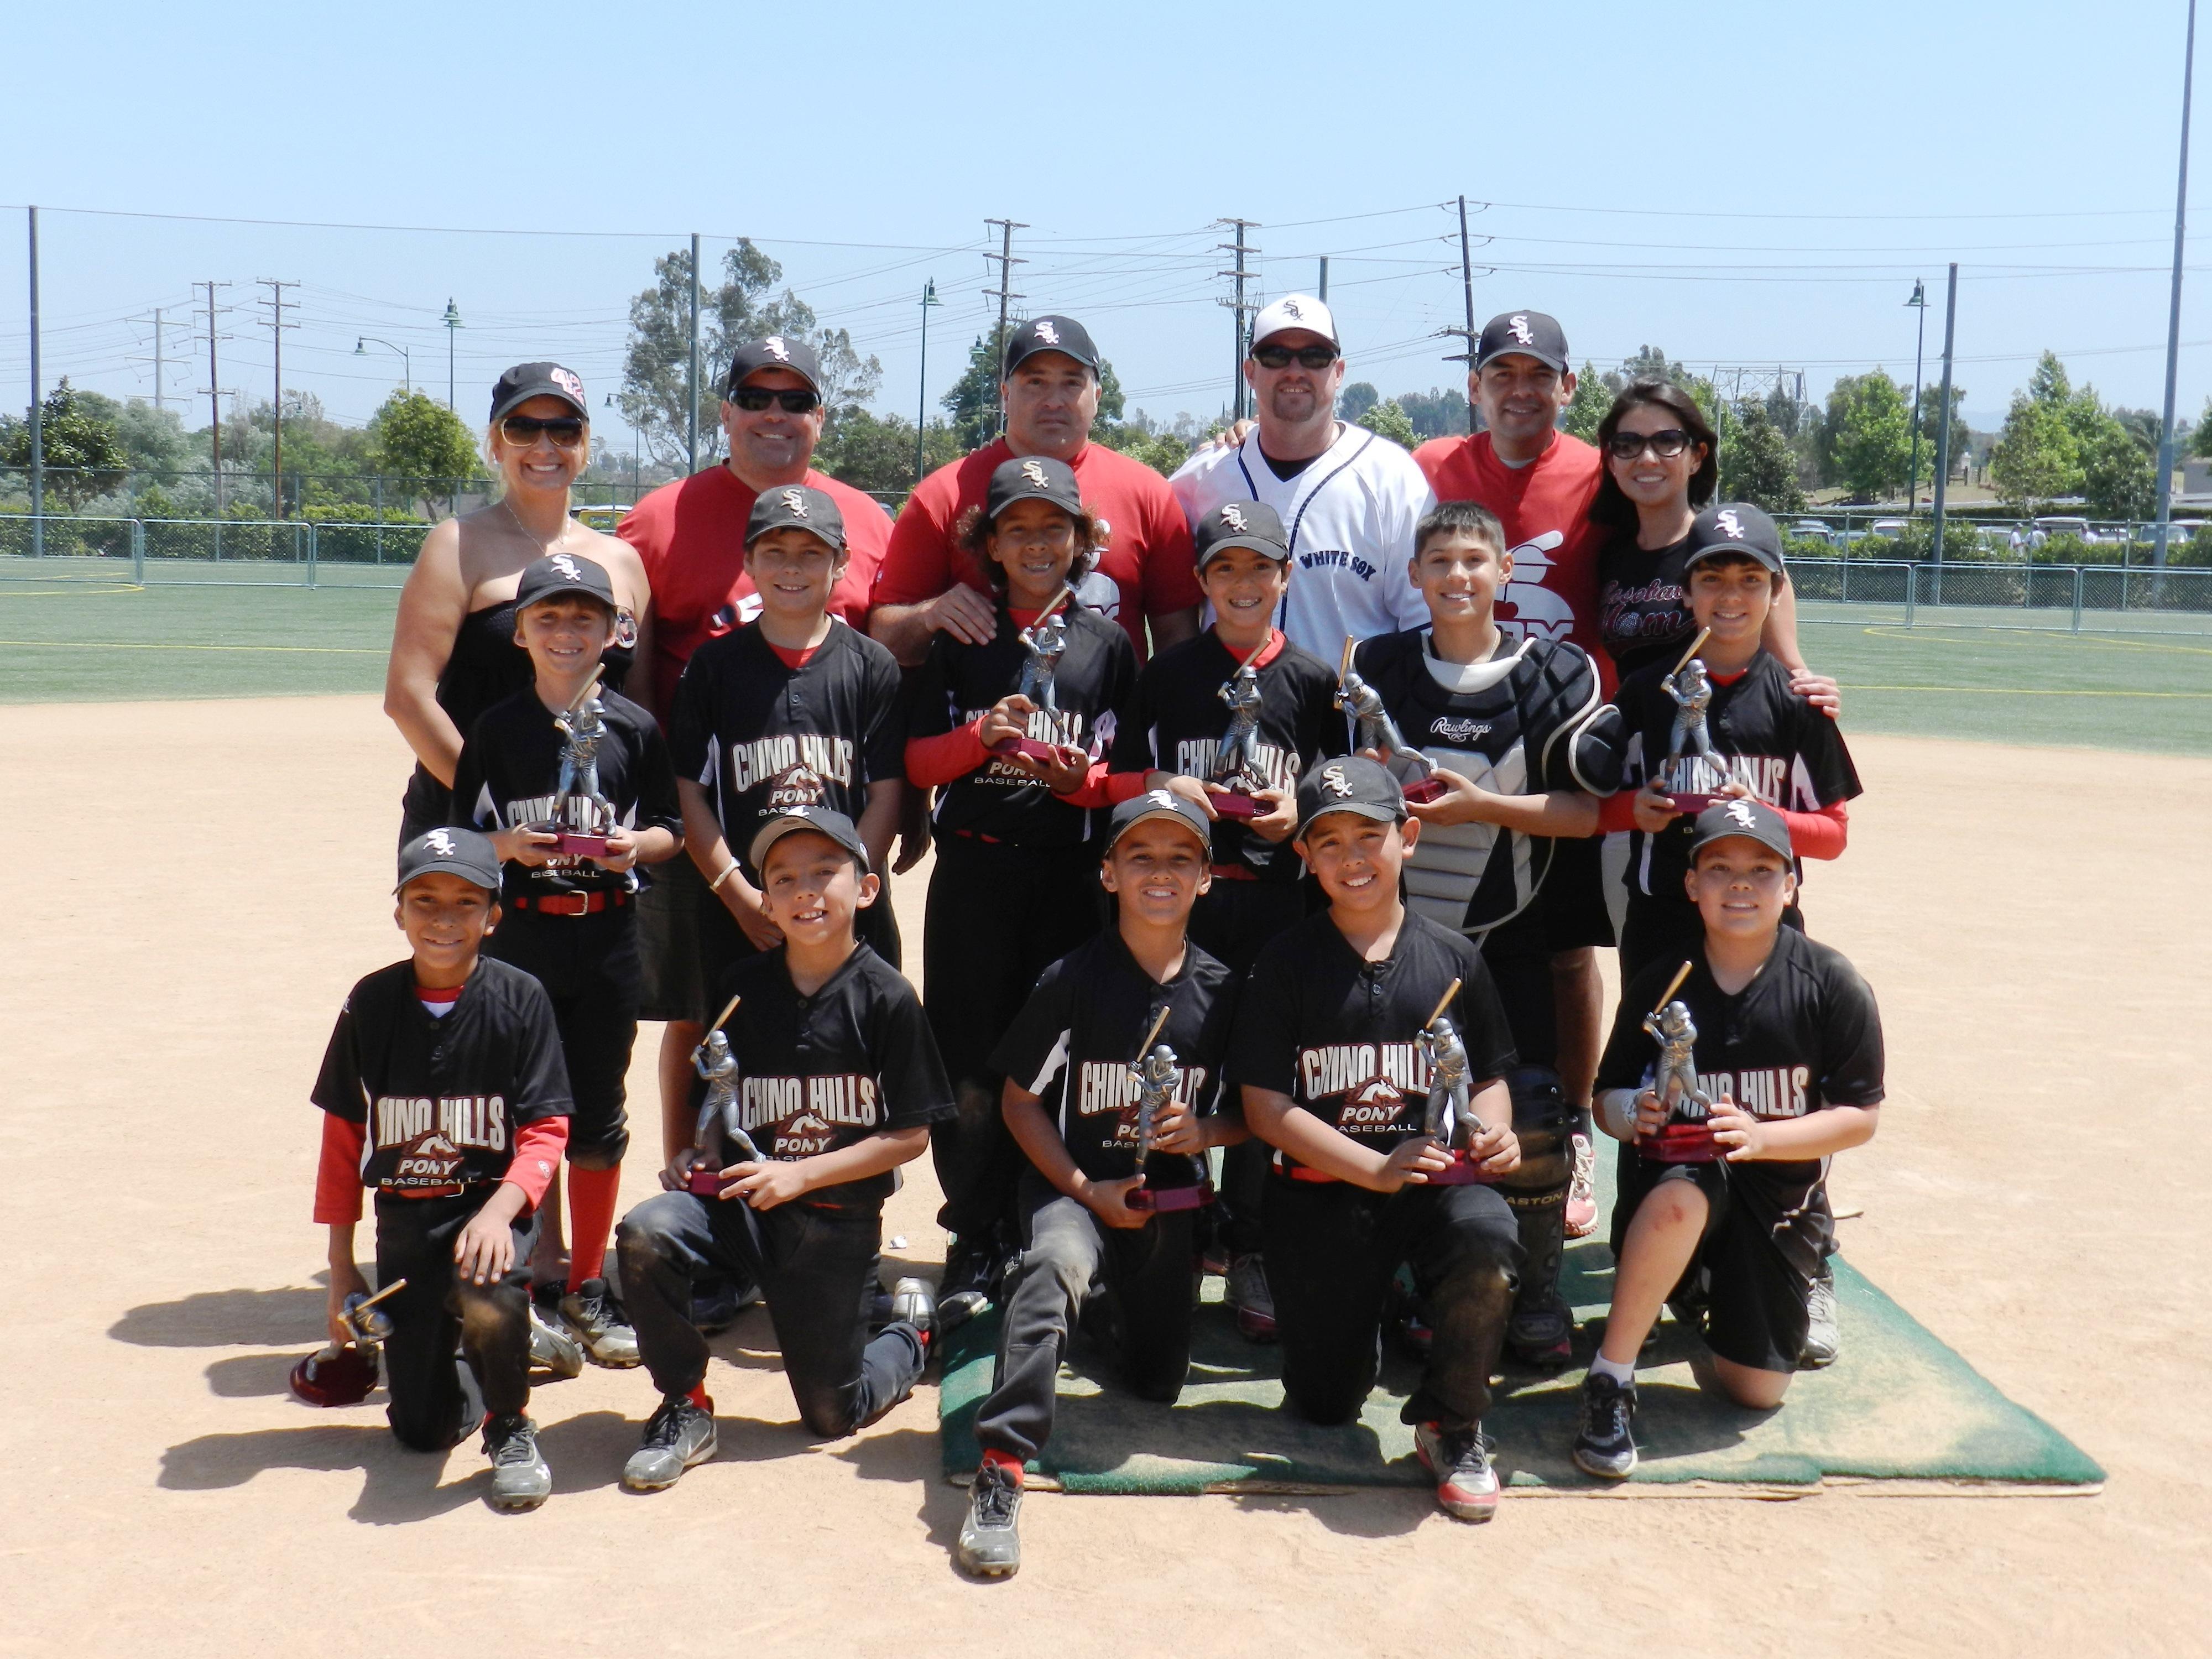 Chino Hills Pony Baseball – Icalliance